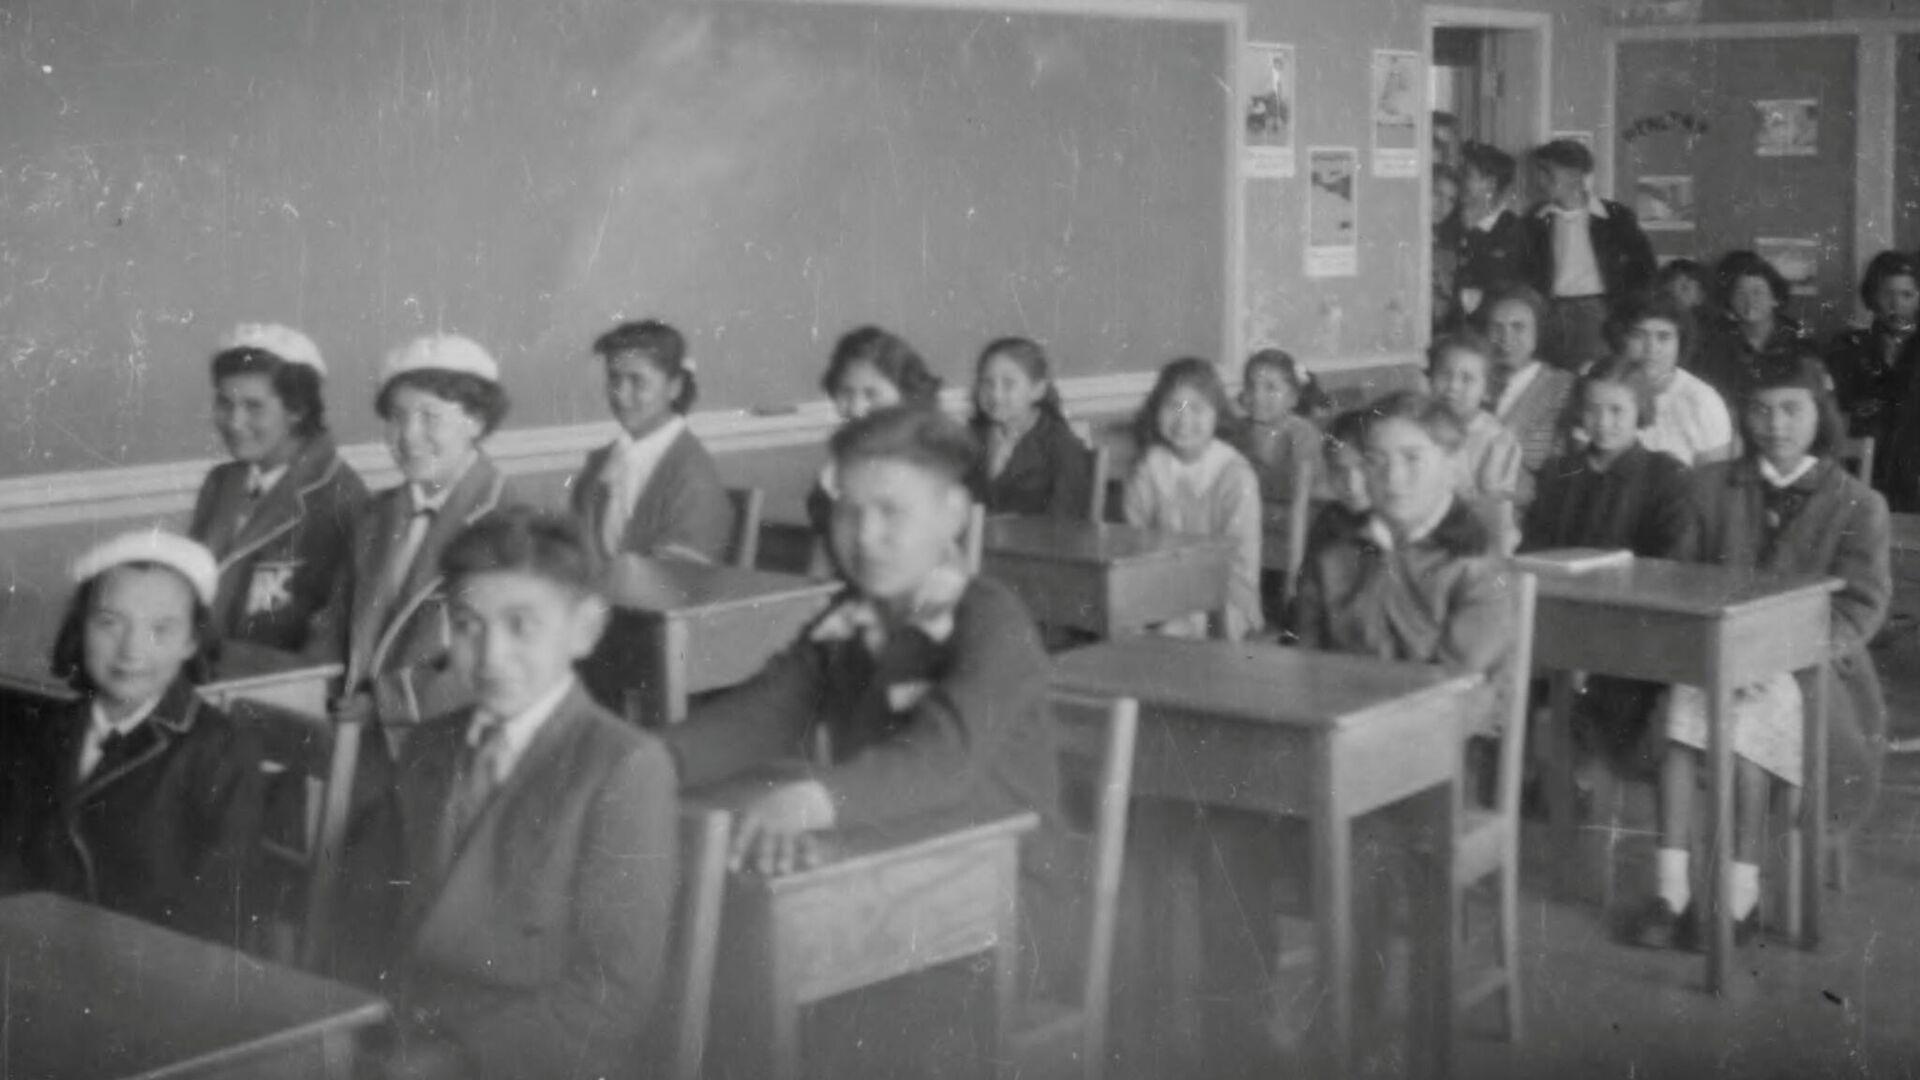 Kuper Island Residential School in der Provinz British Columbia, Kanada (Archivbild) - SNA, 1920, 14.07.2021